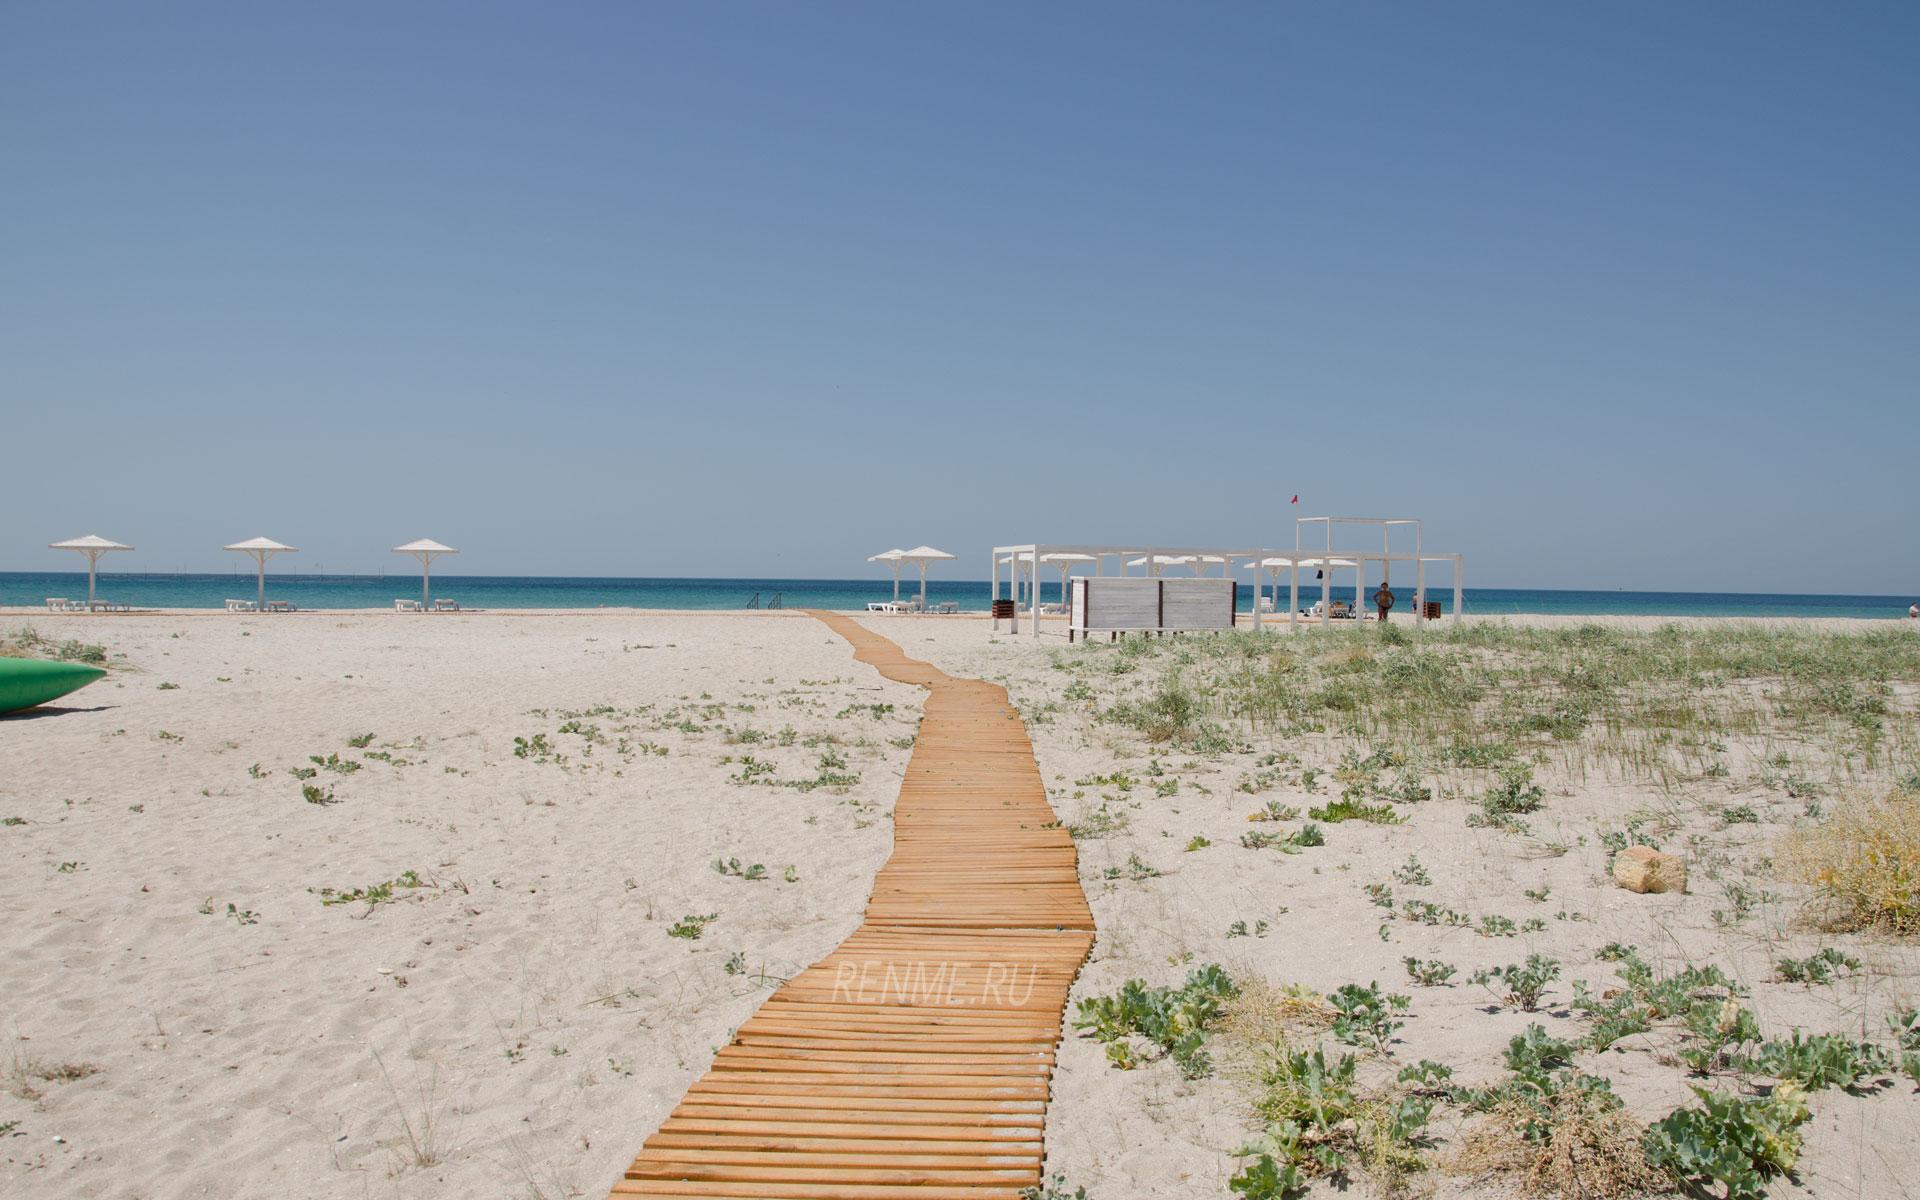 Дорожка к морю на пляже Белые Пески. Фото Оленевки